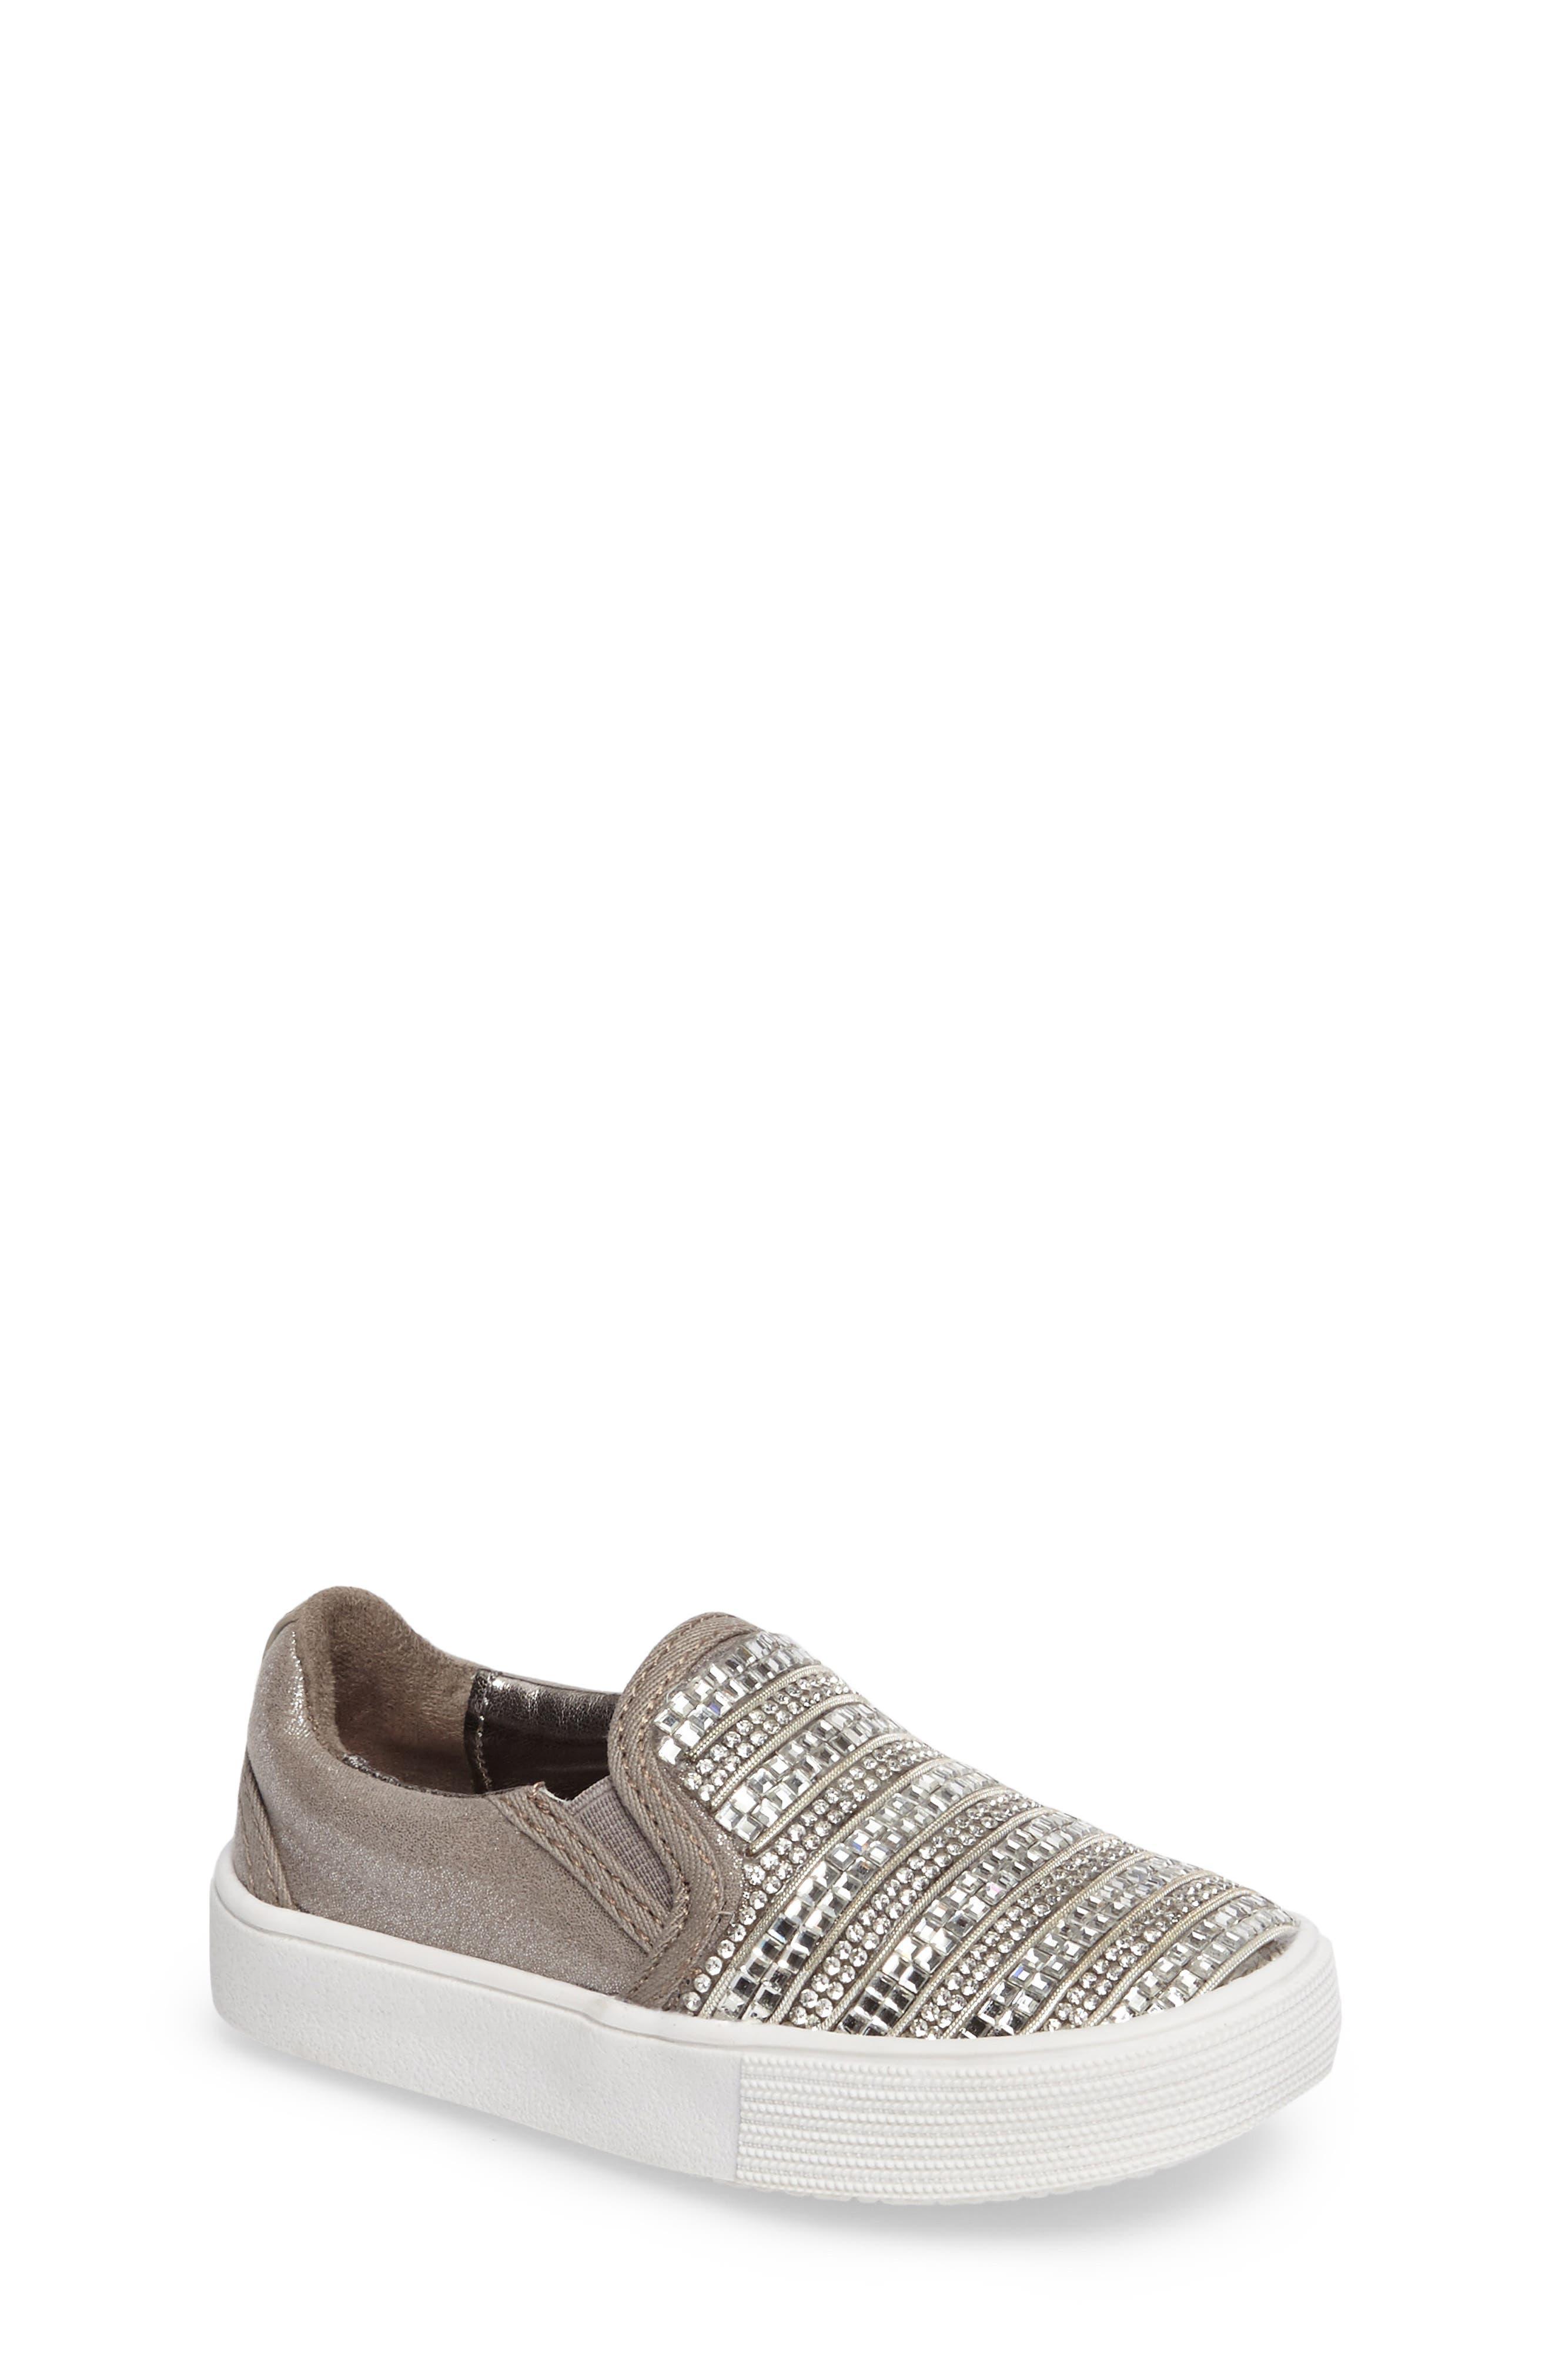 Alternate Image 1 Selected - Stuart Weitzman Vance Glitz Embellished Slip-On Sneaker (Walker & Toddler)